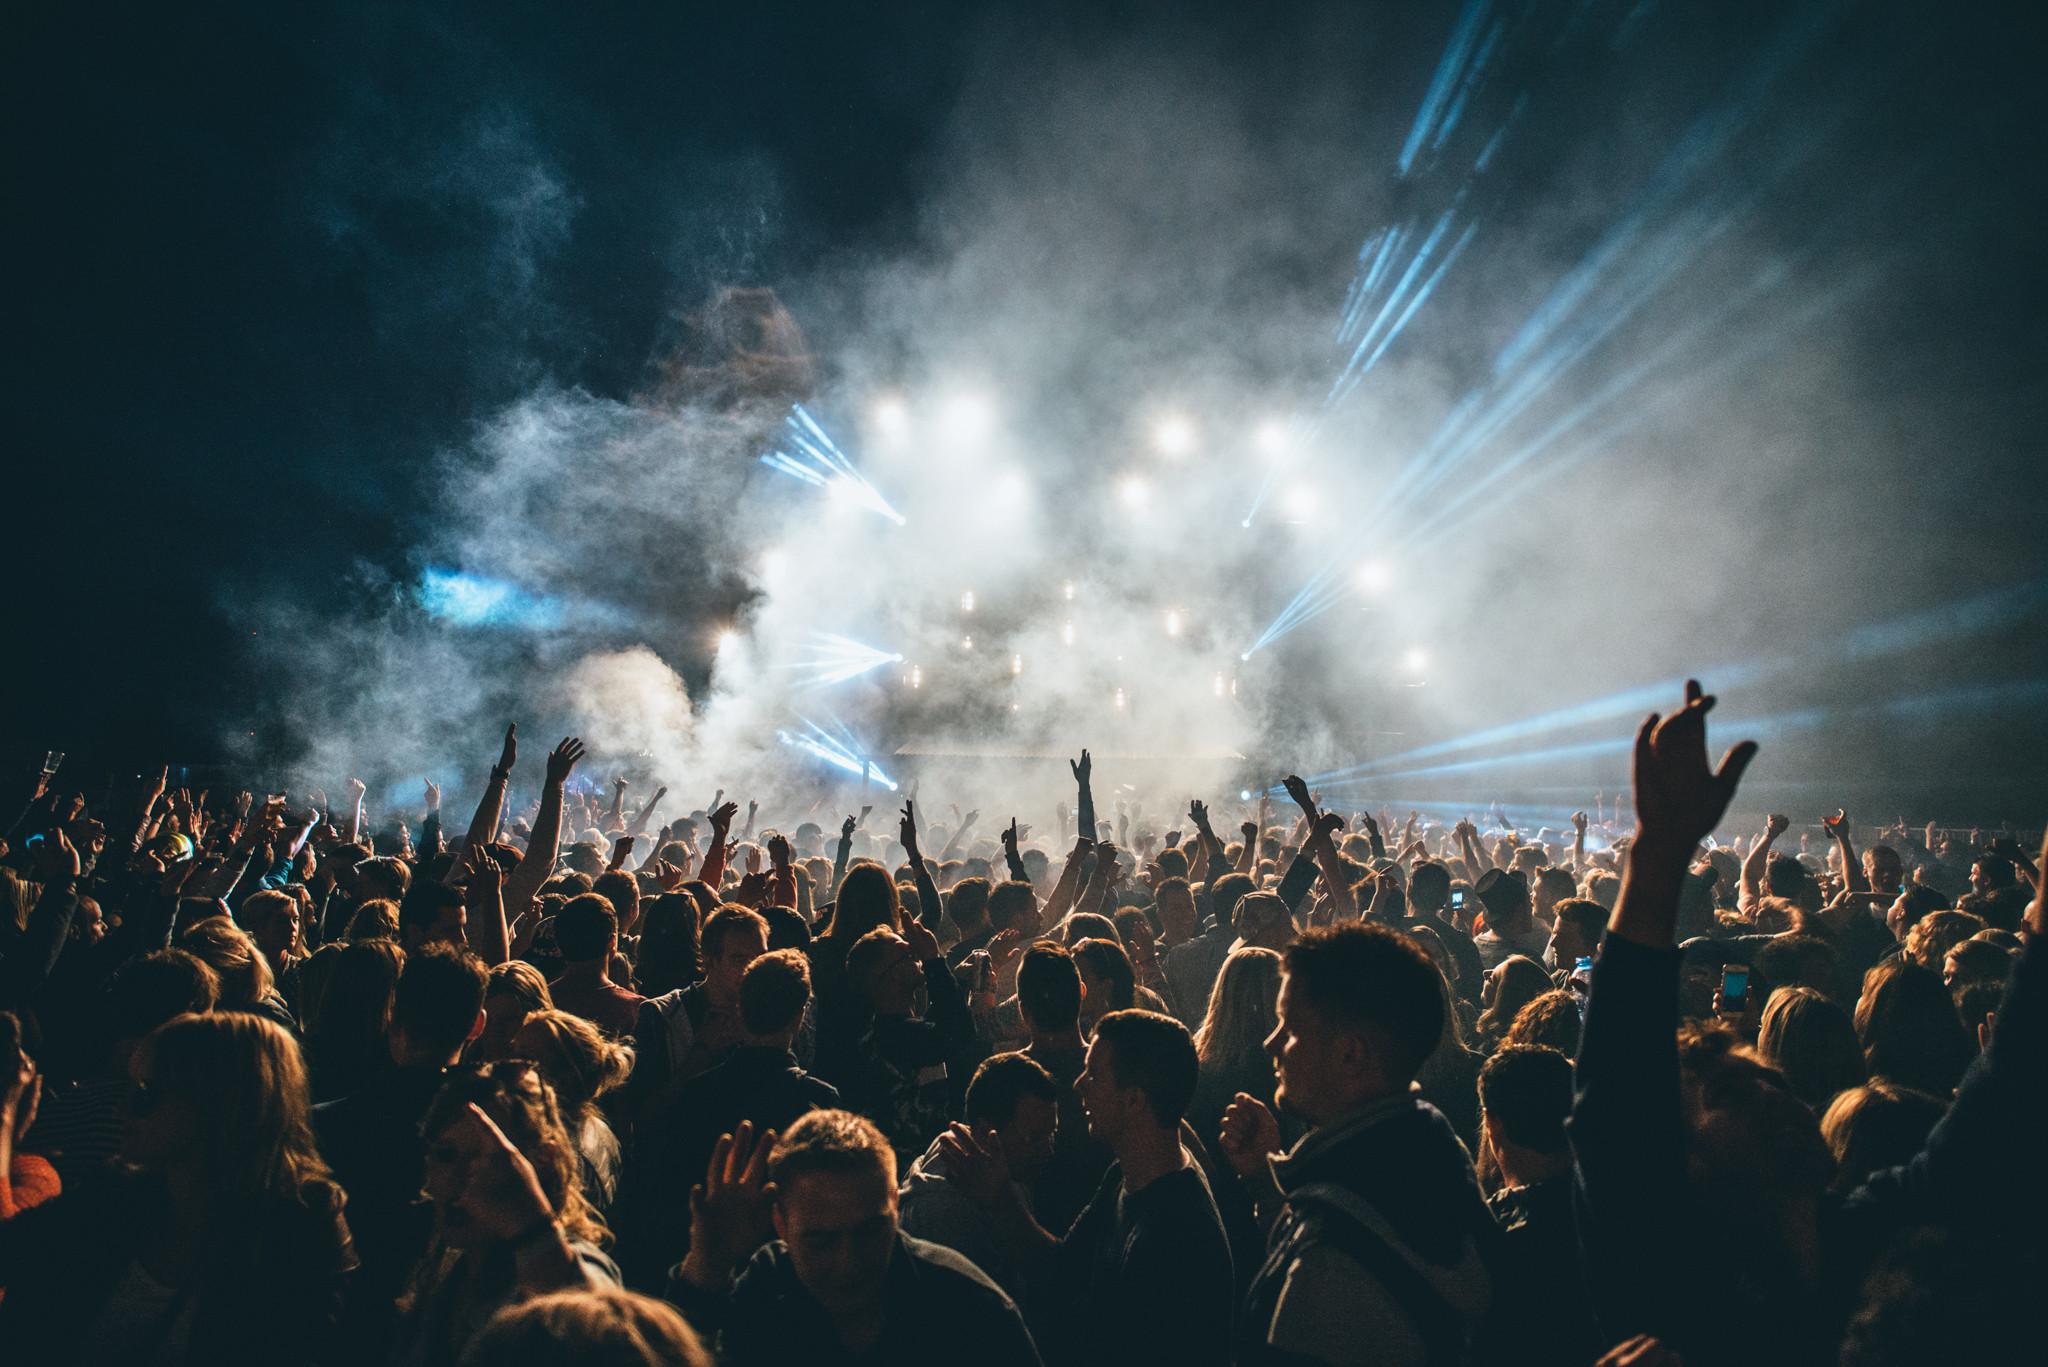 Op Dreef Festival 2015, Roermond by Tim Buiting © Stichting Op Dreef